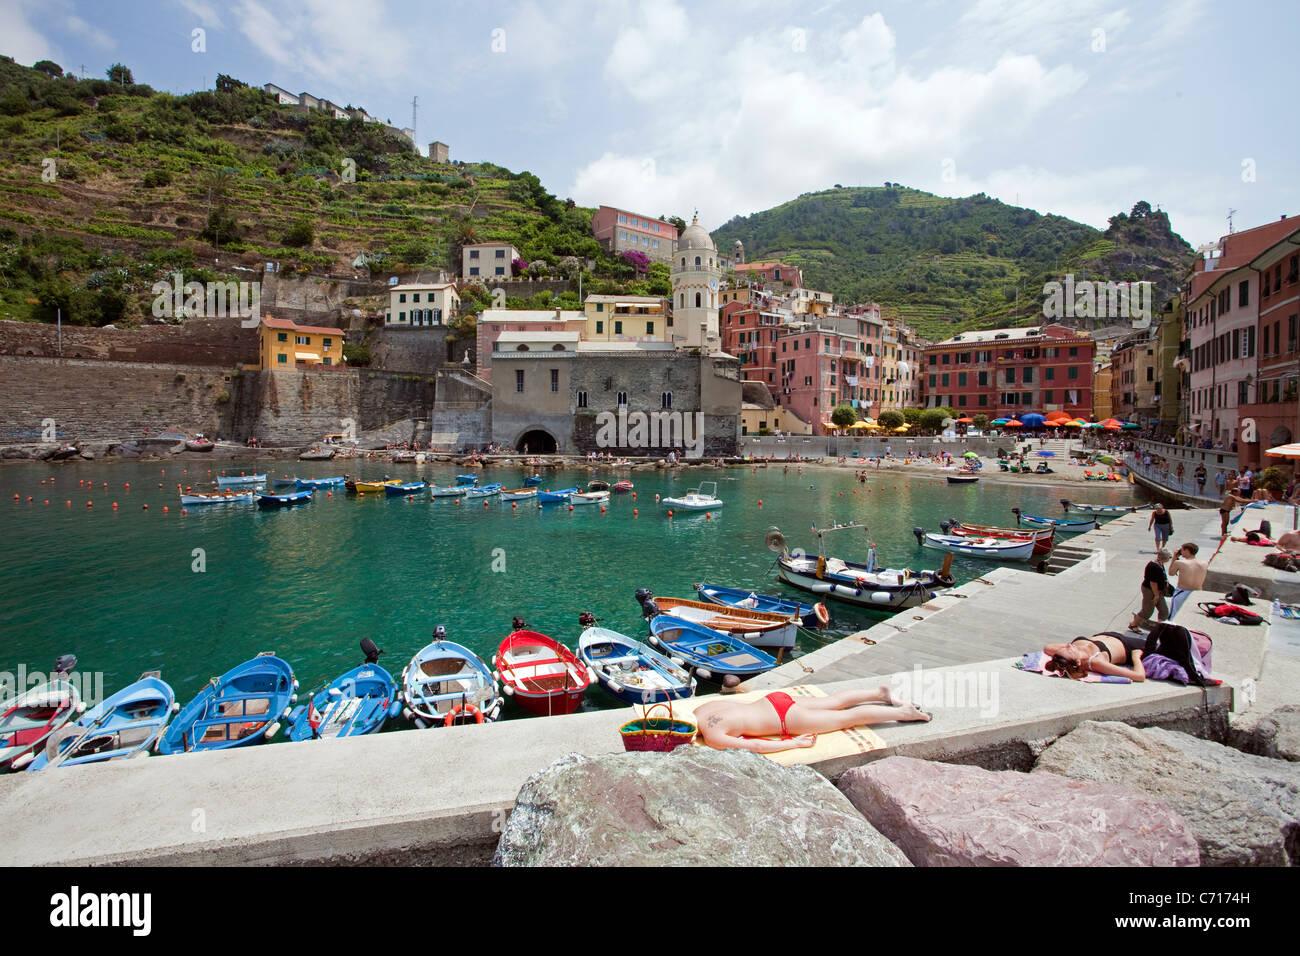 Sunbath at fishing village Vernazza, National park Cinque Terre, Unesco World Heritage site, Liguria di Levante, - Stock Image